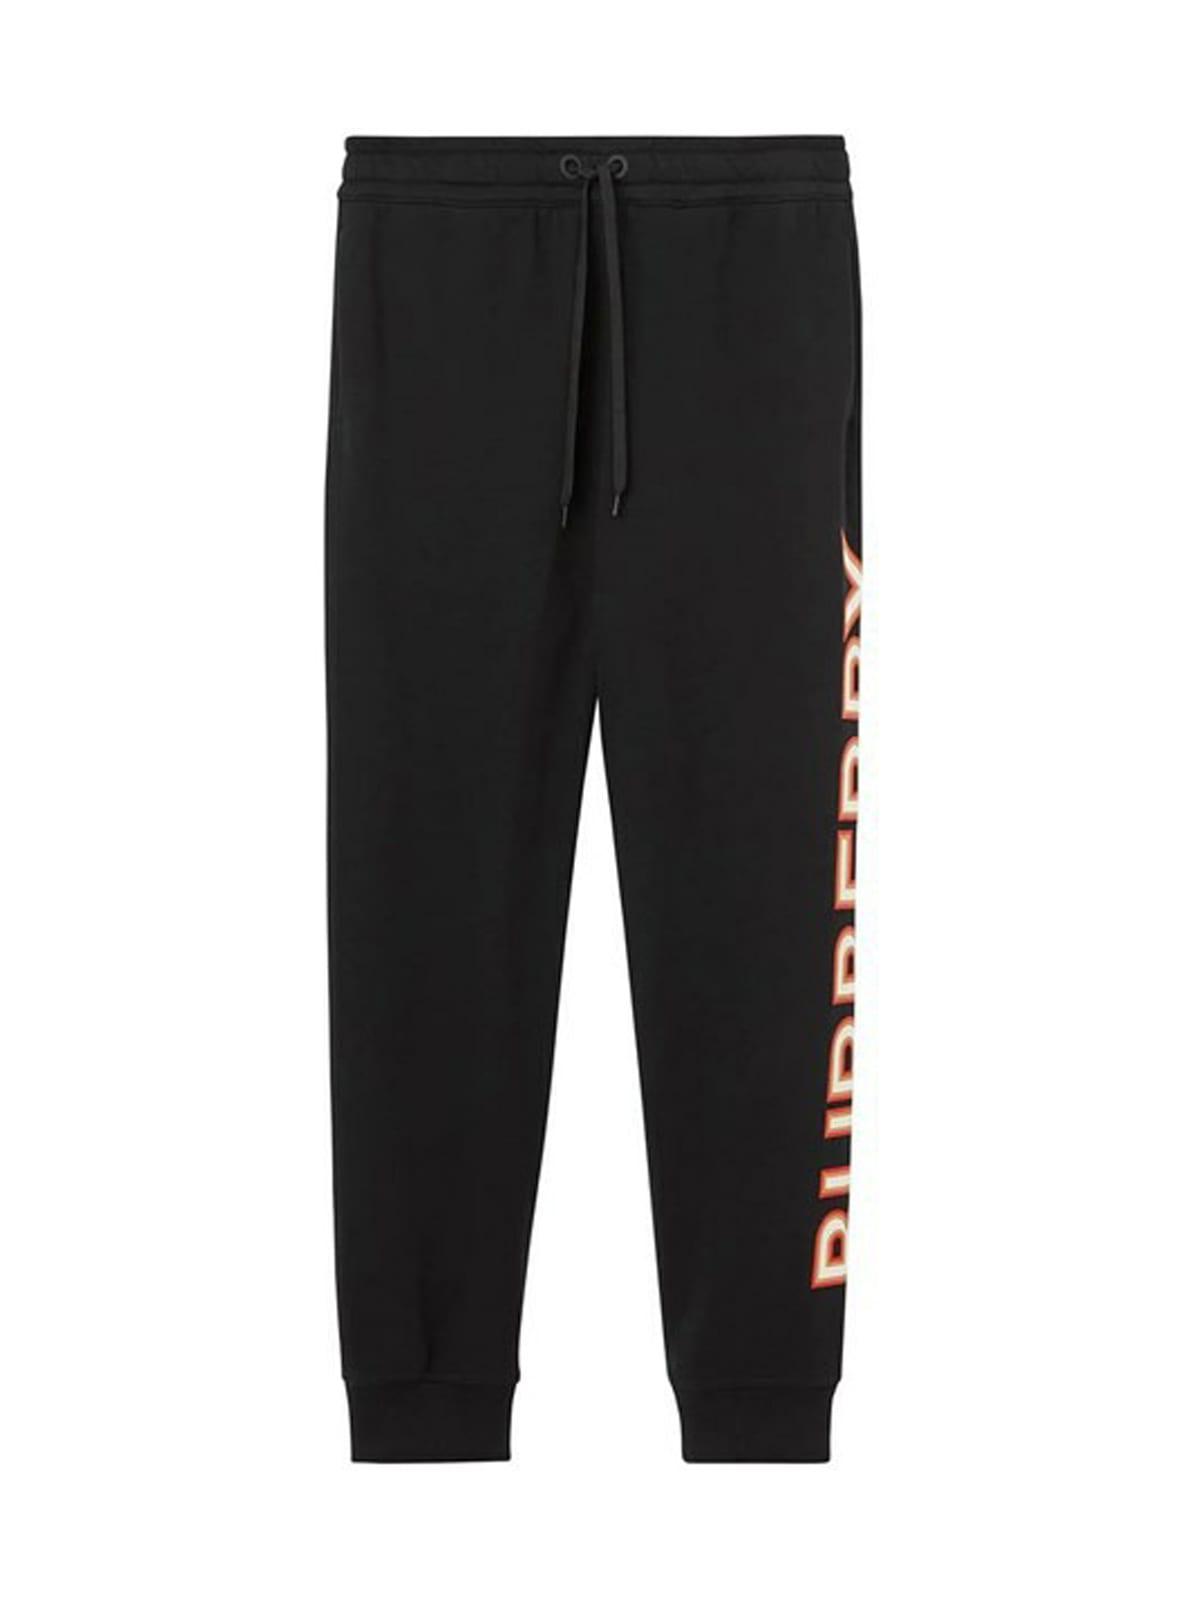 Burberry Track pants ESMEE TRACK PANTS